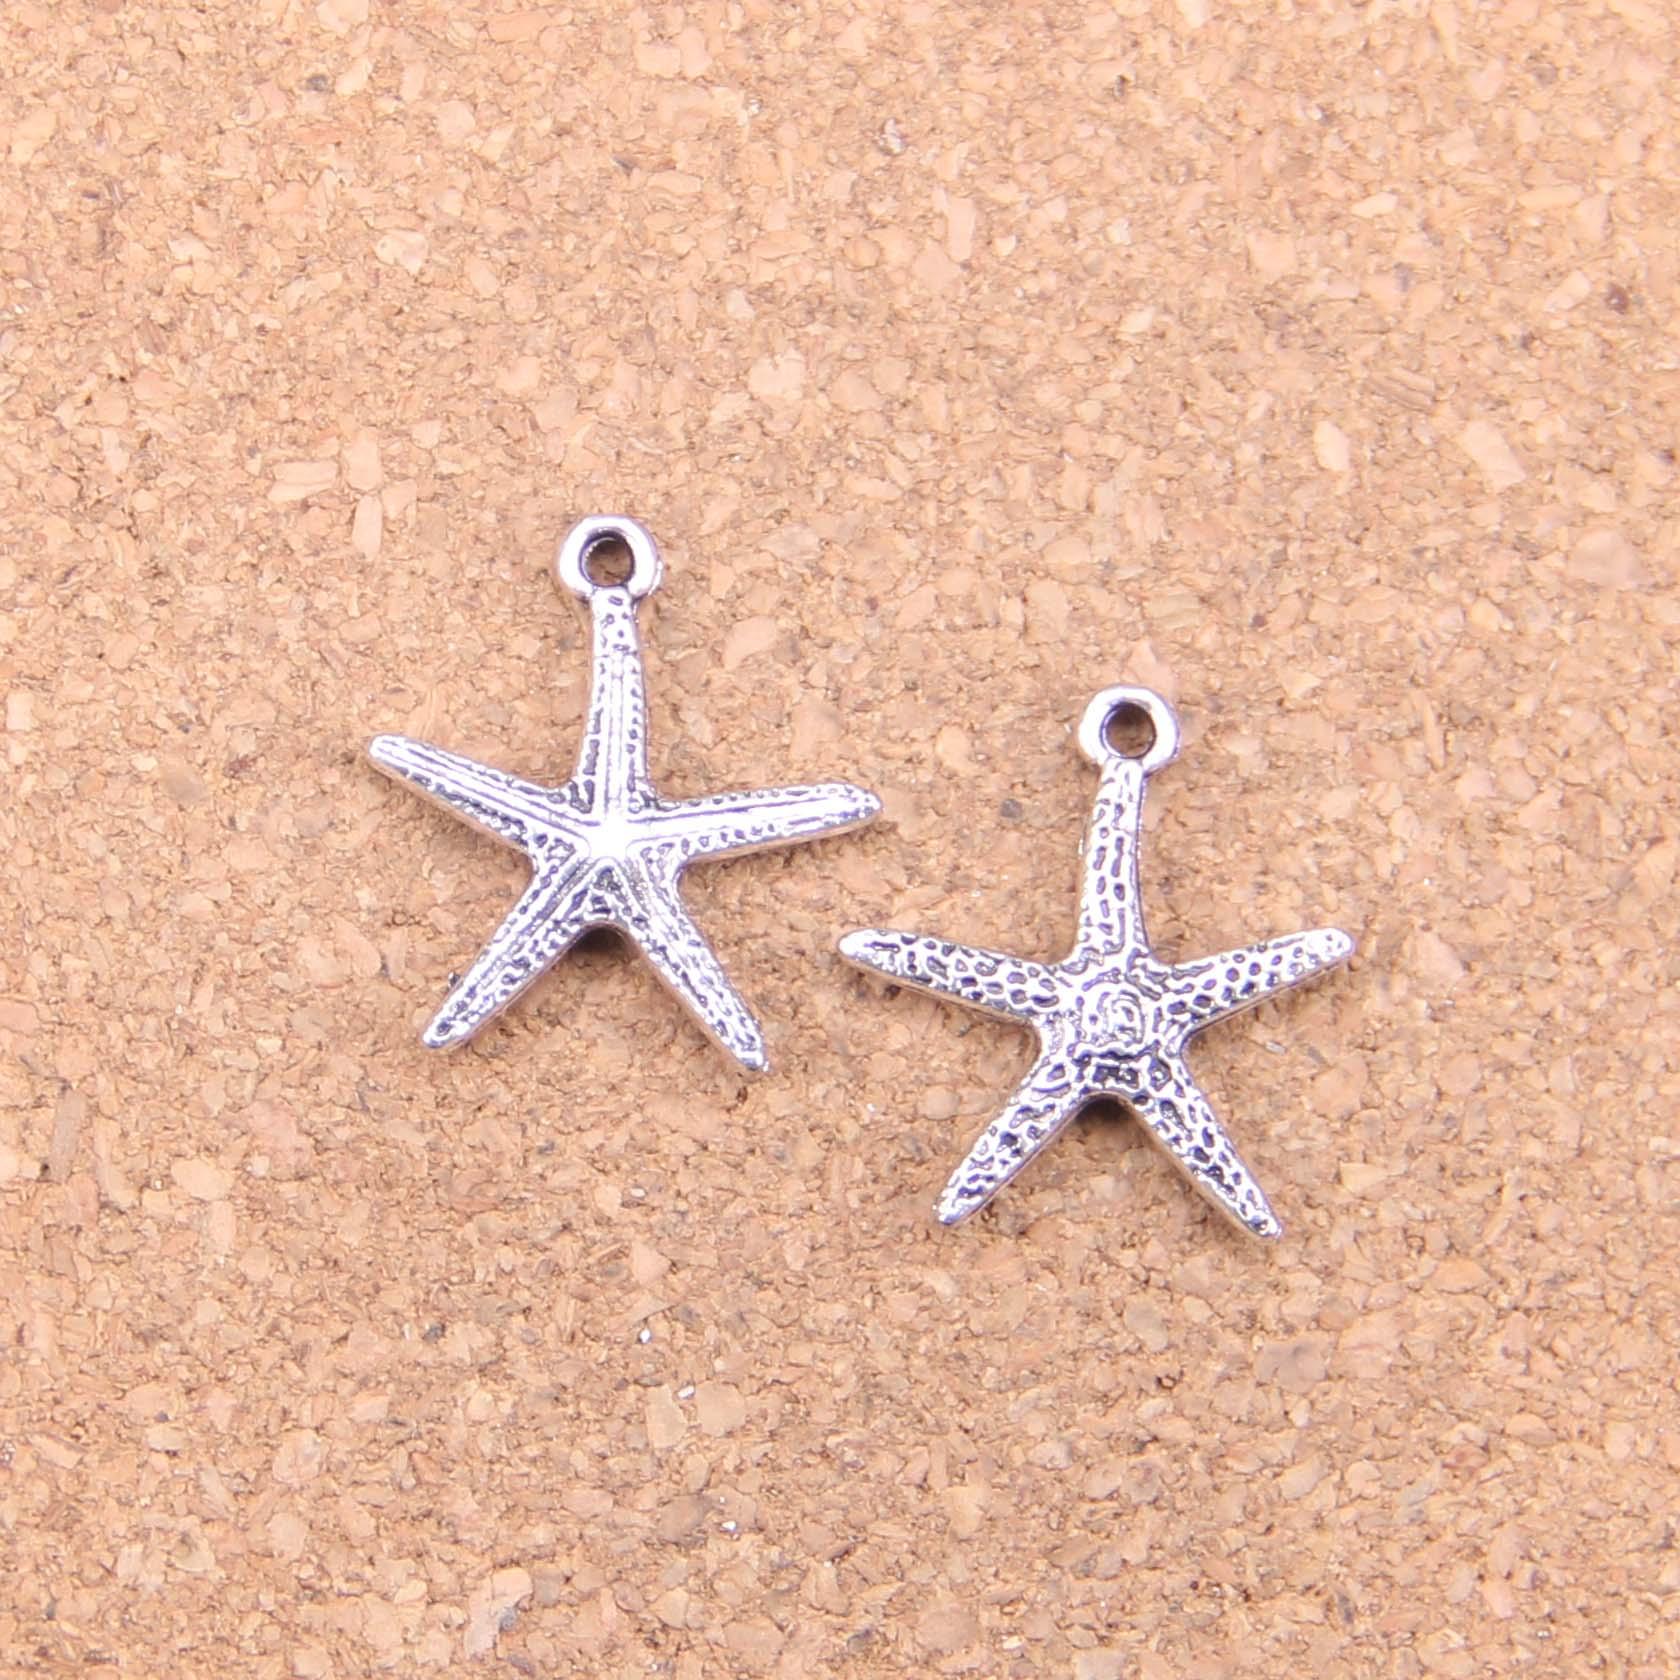 10 x Tibetan Silver Starfish Sea Star Charms Pendants Beads 26x23mm